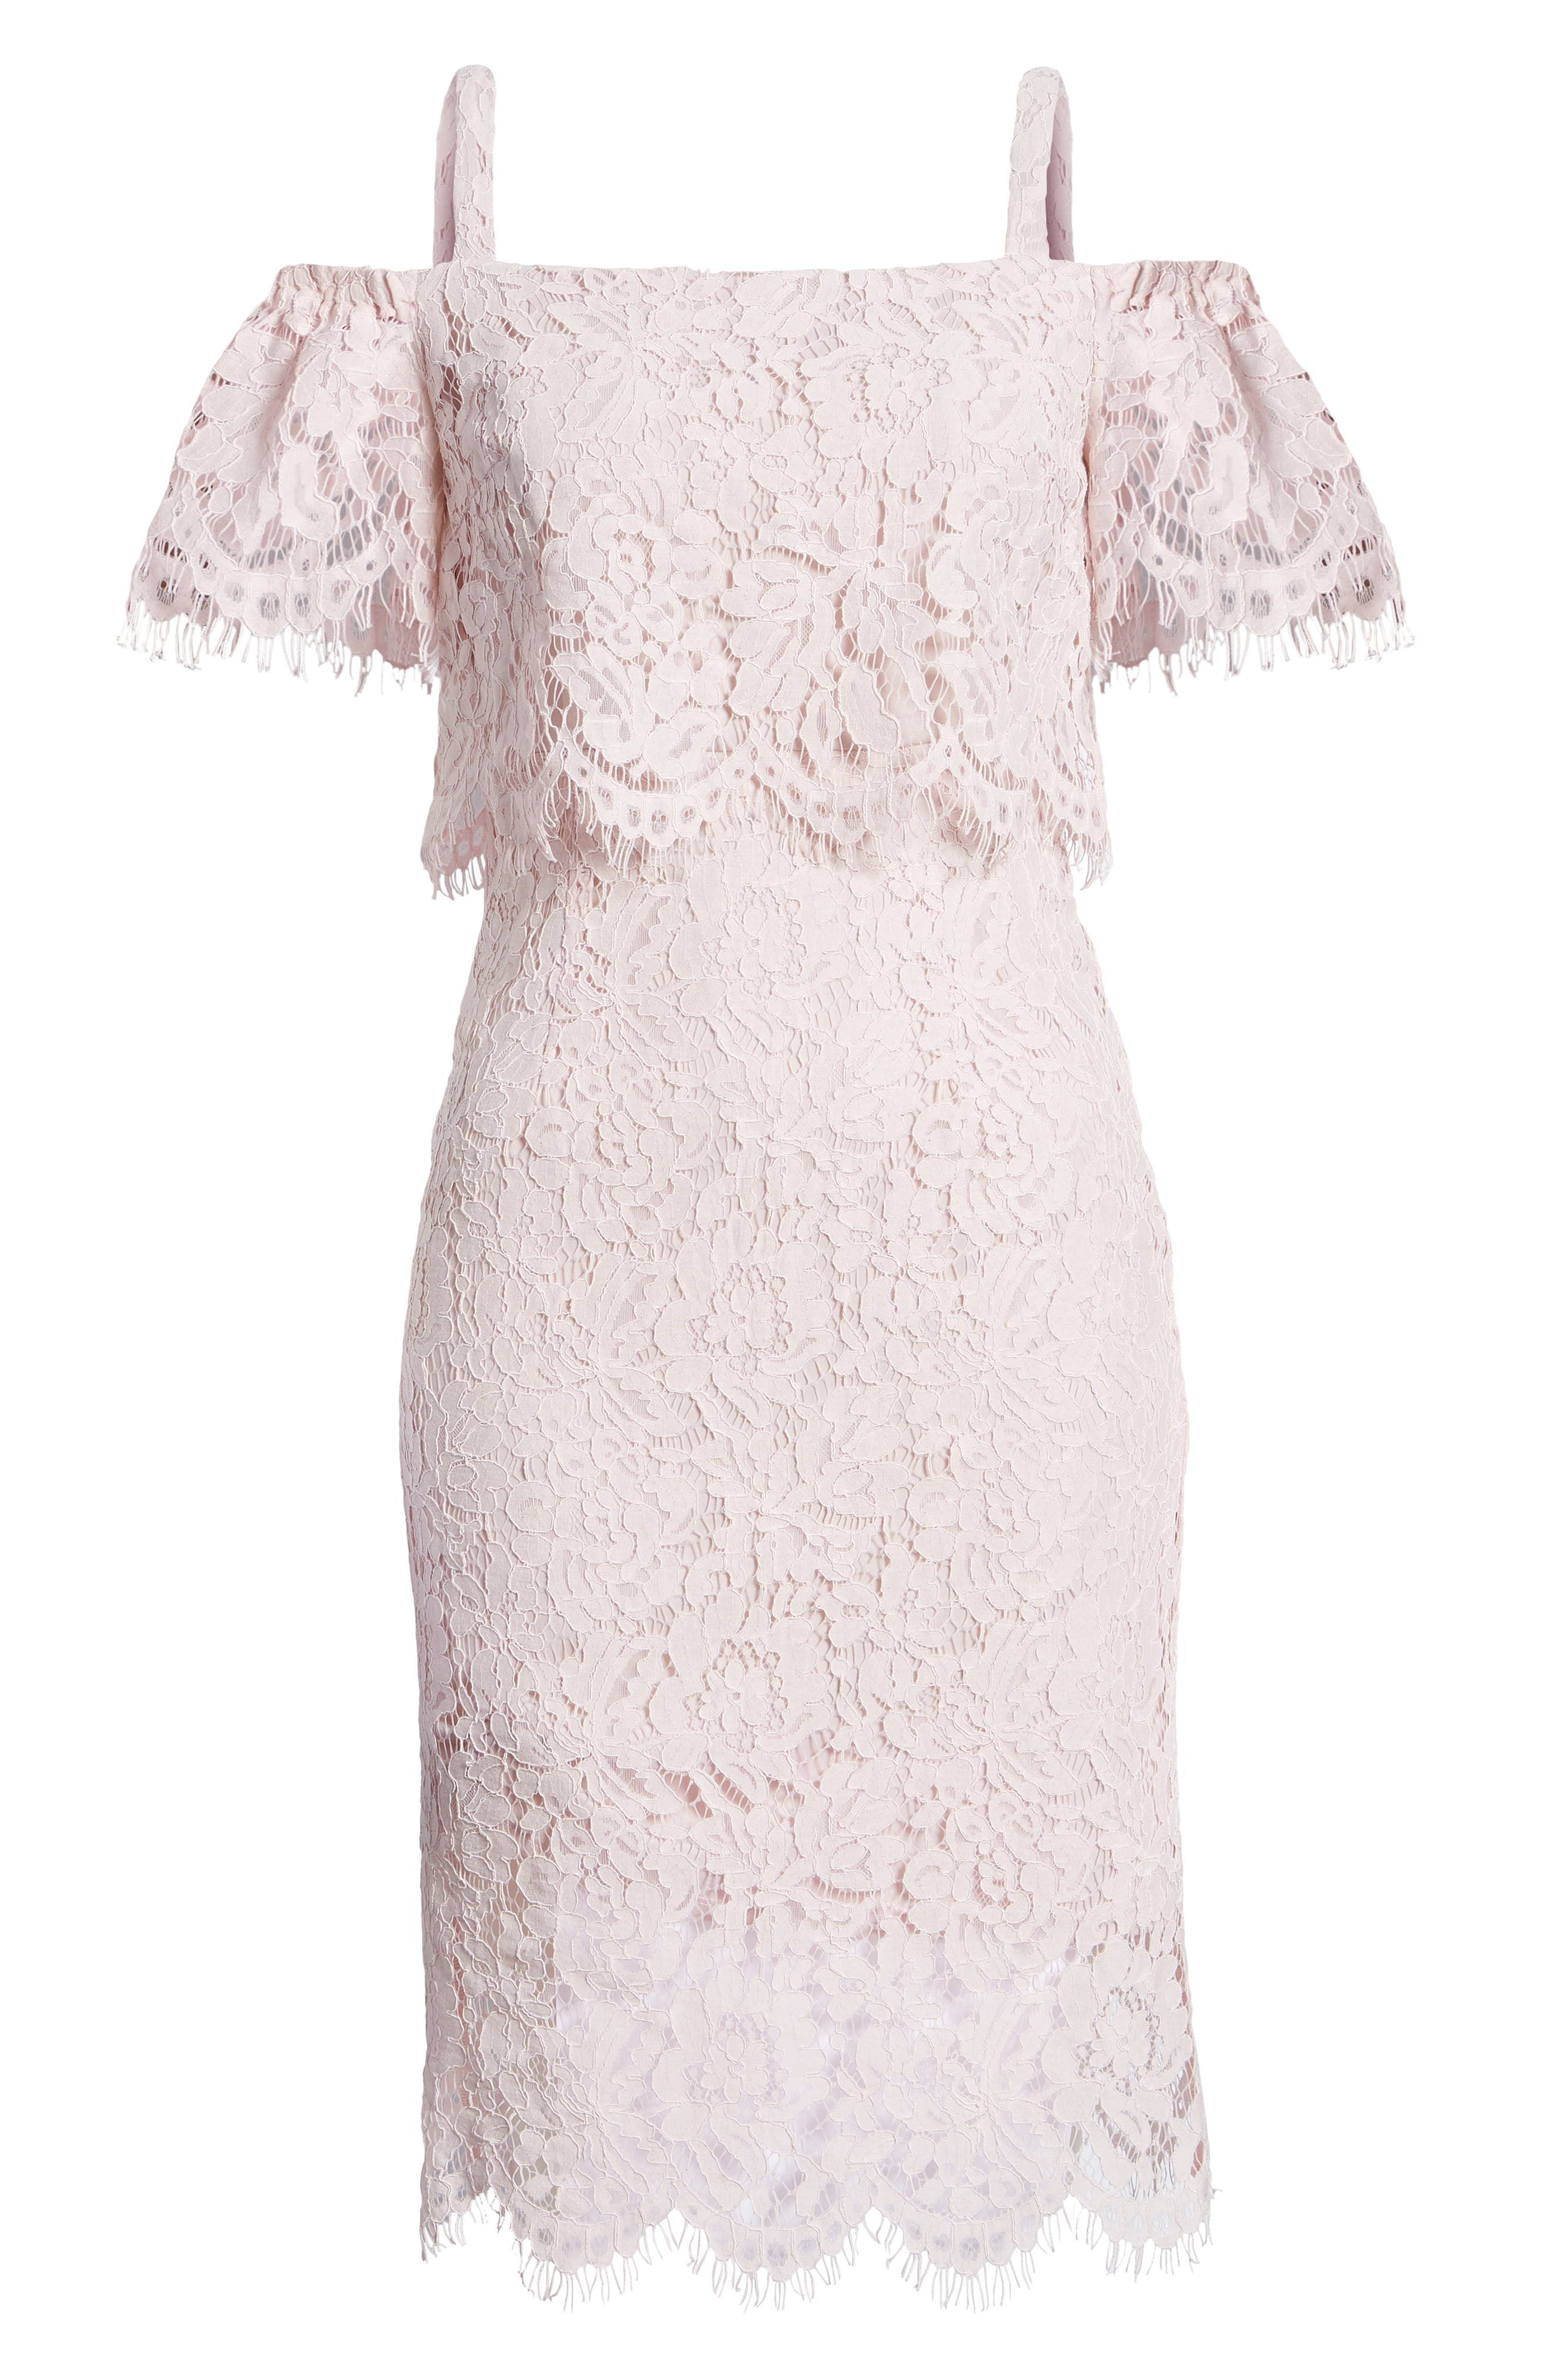 Popover Lace Dress,                             Alternate thumbnail 7, color,                             Pale Pink